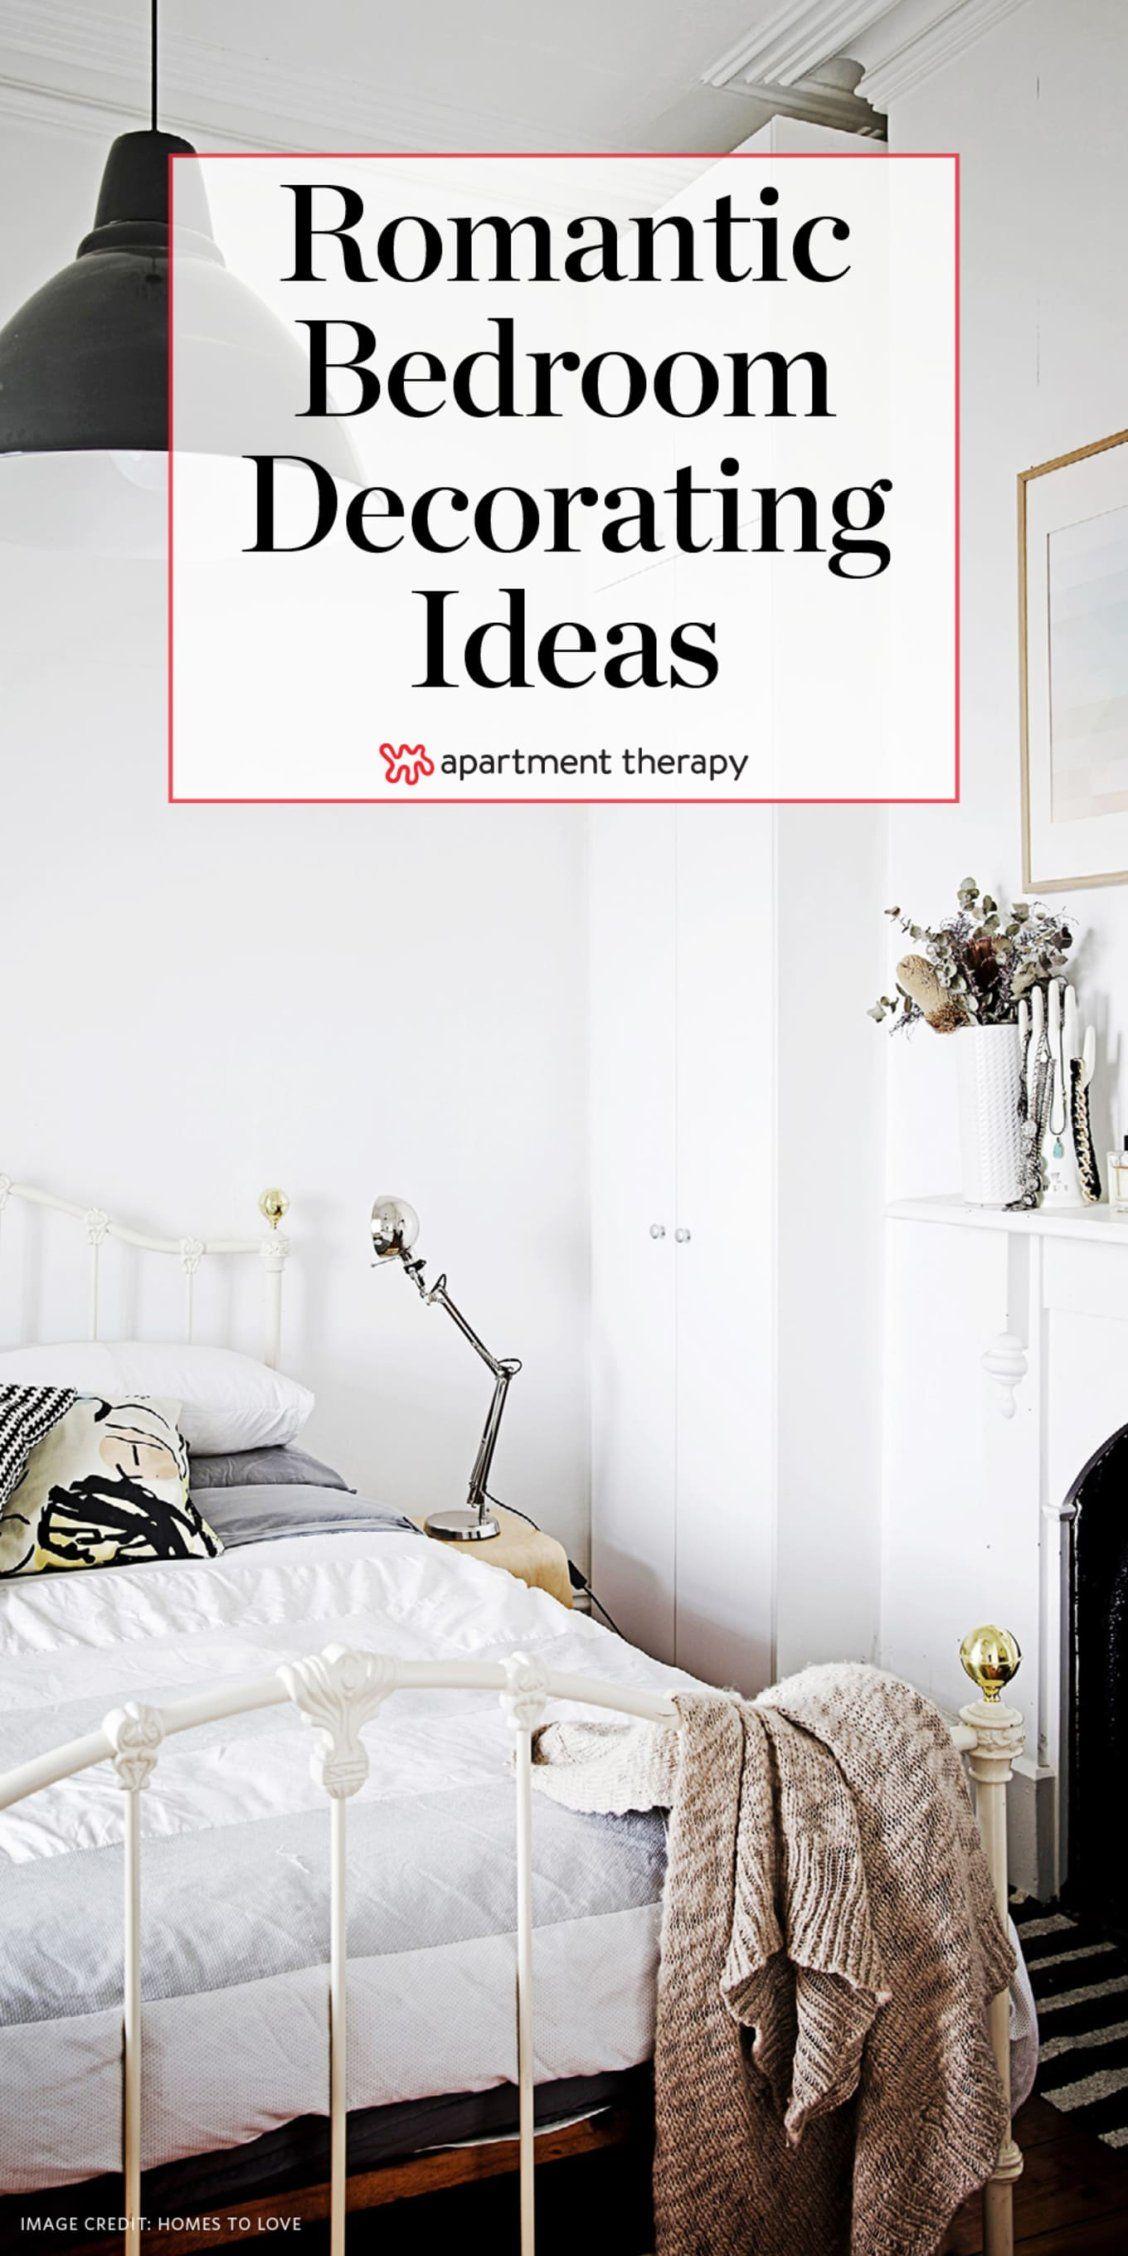 Modern Romantic Bedroom Designs: 12 Completely Un-Cheesy Ways To Create A Romantic Bedroom